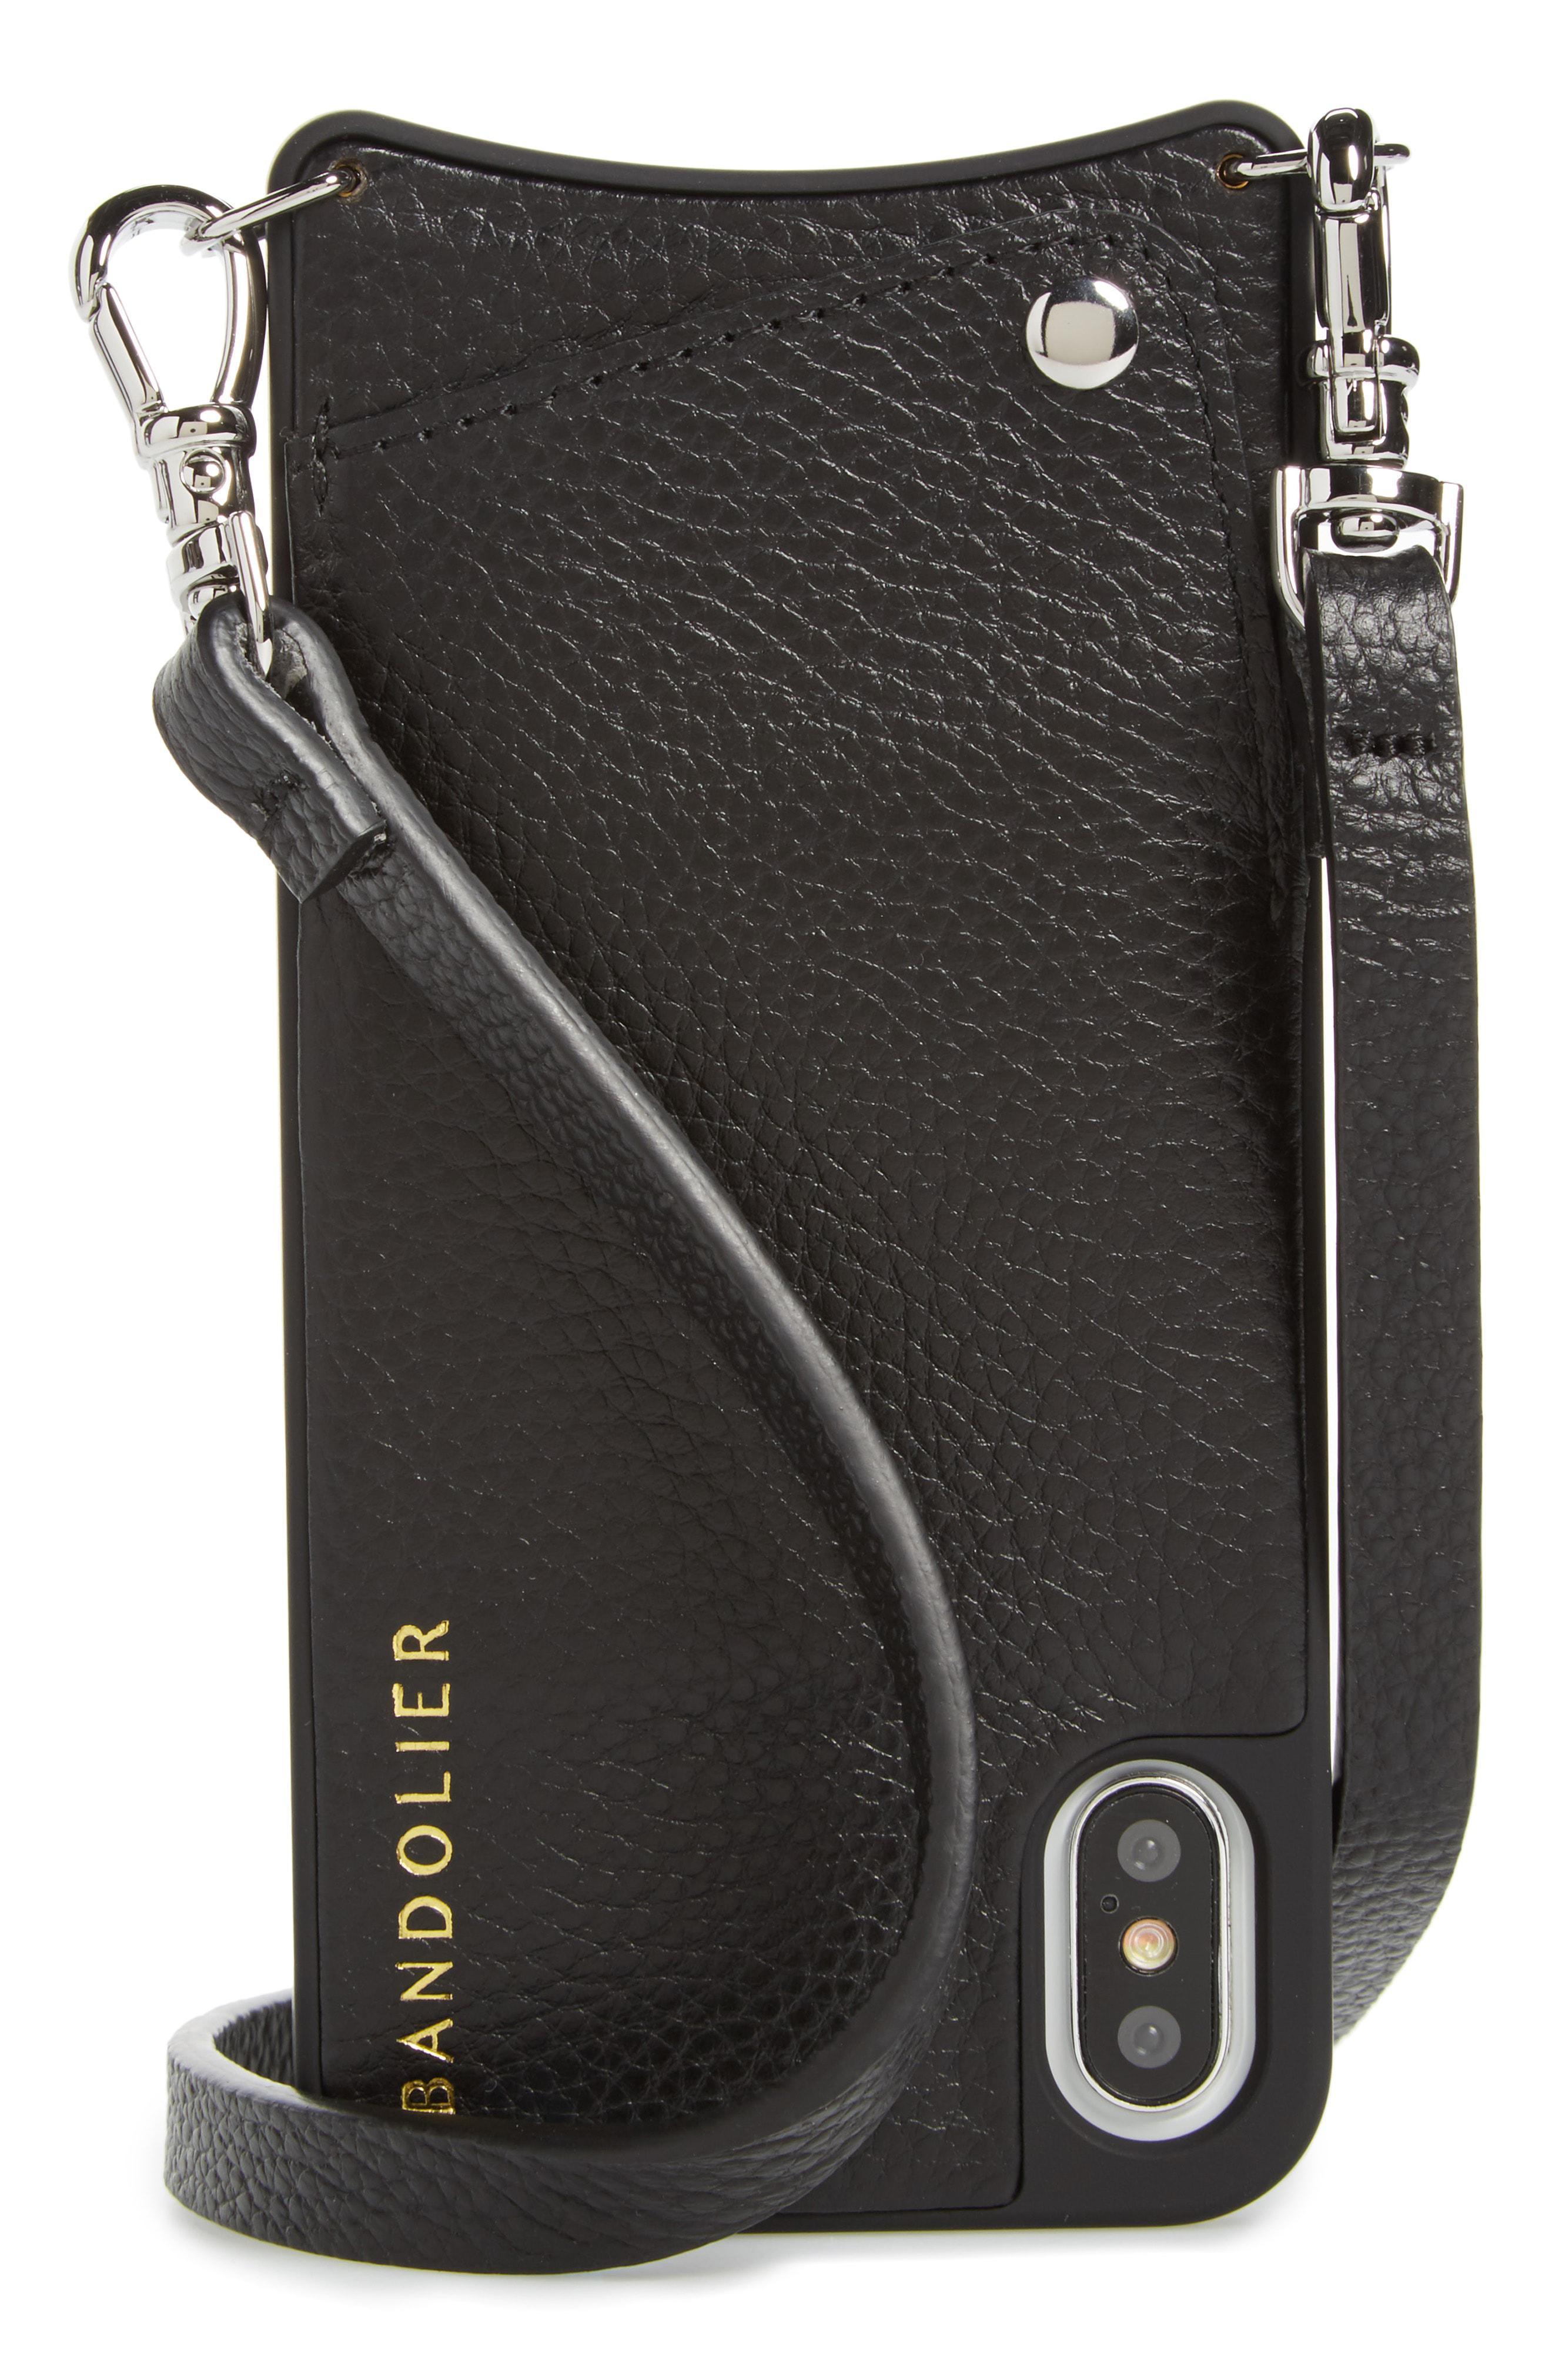 7337467d34ca Bandolier - Black Emma Leather Iphone X xs Case - Lyst. View fullscreen